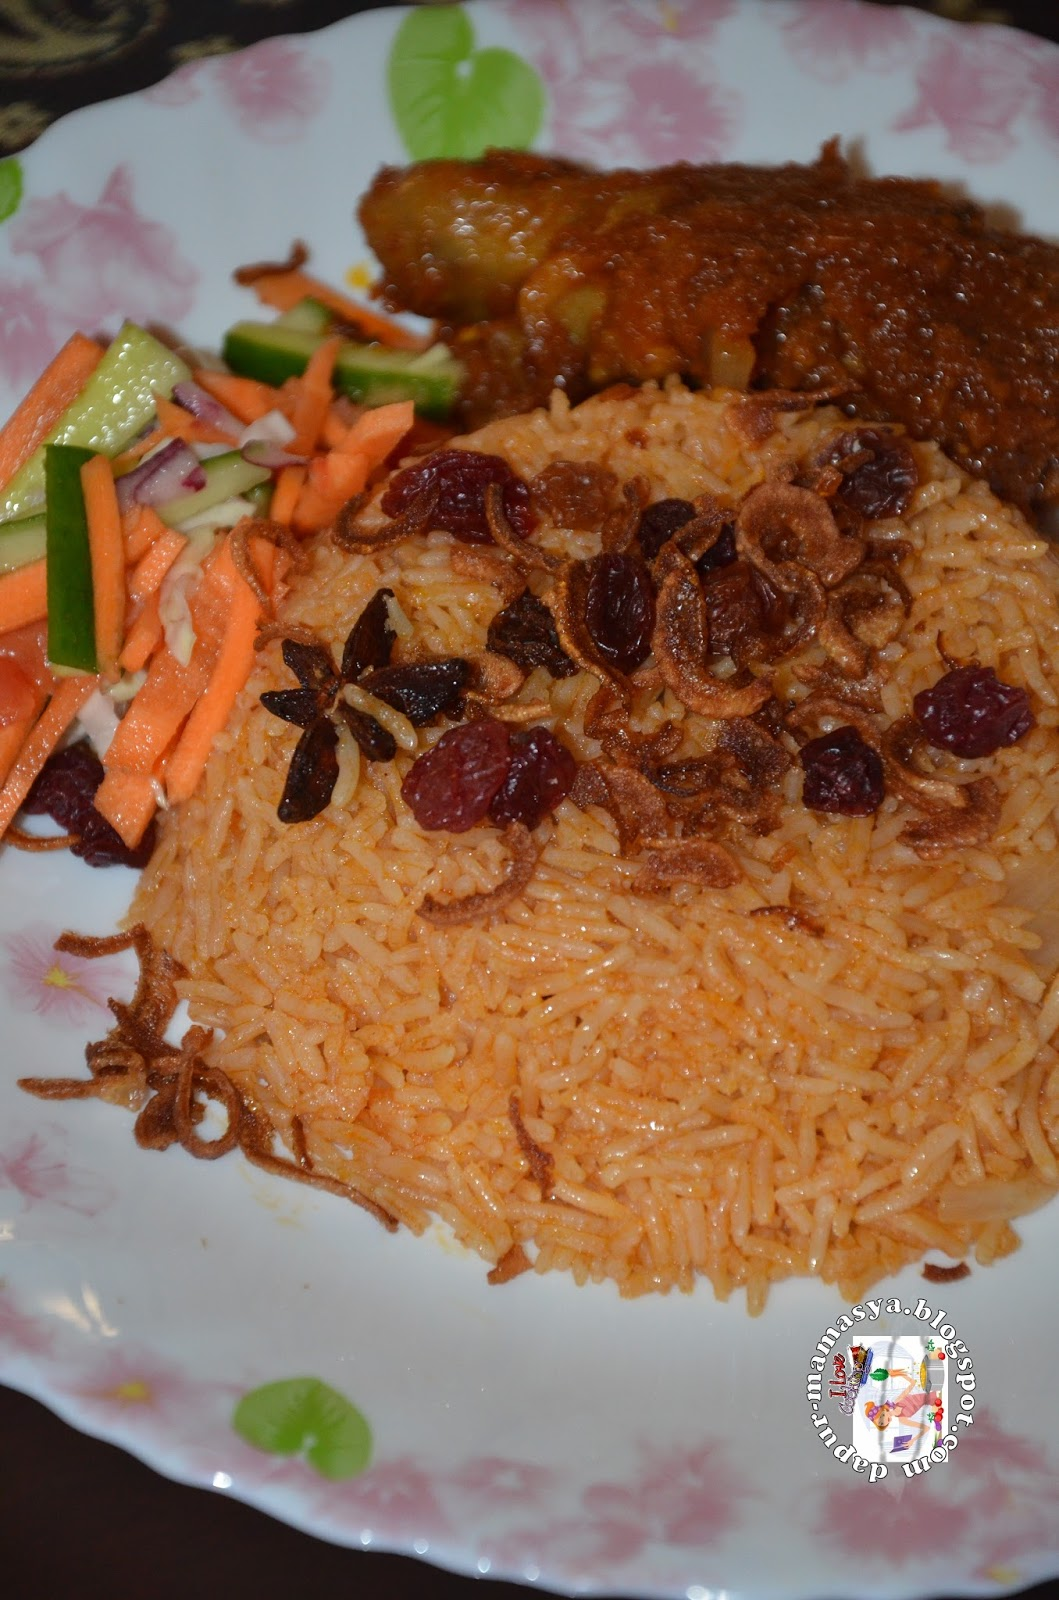 Resepi Nasi Ayam Dari Azie Kitchen Copd Blog H